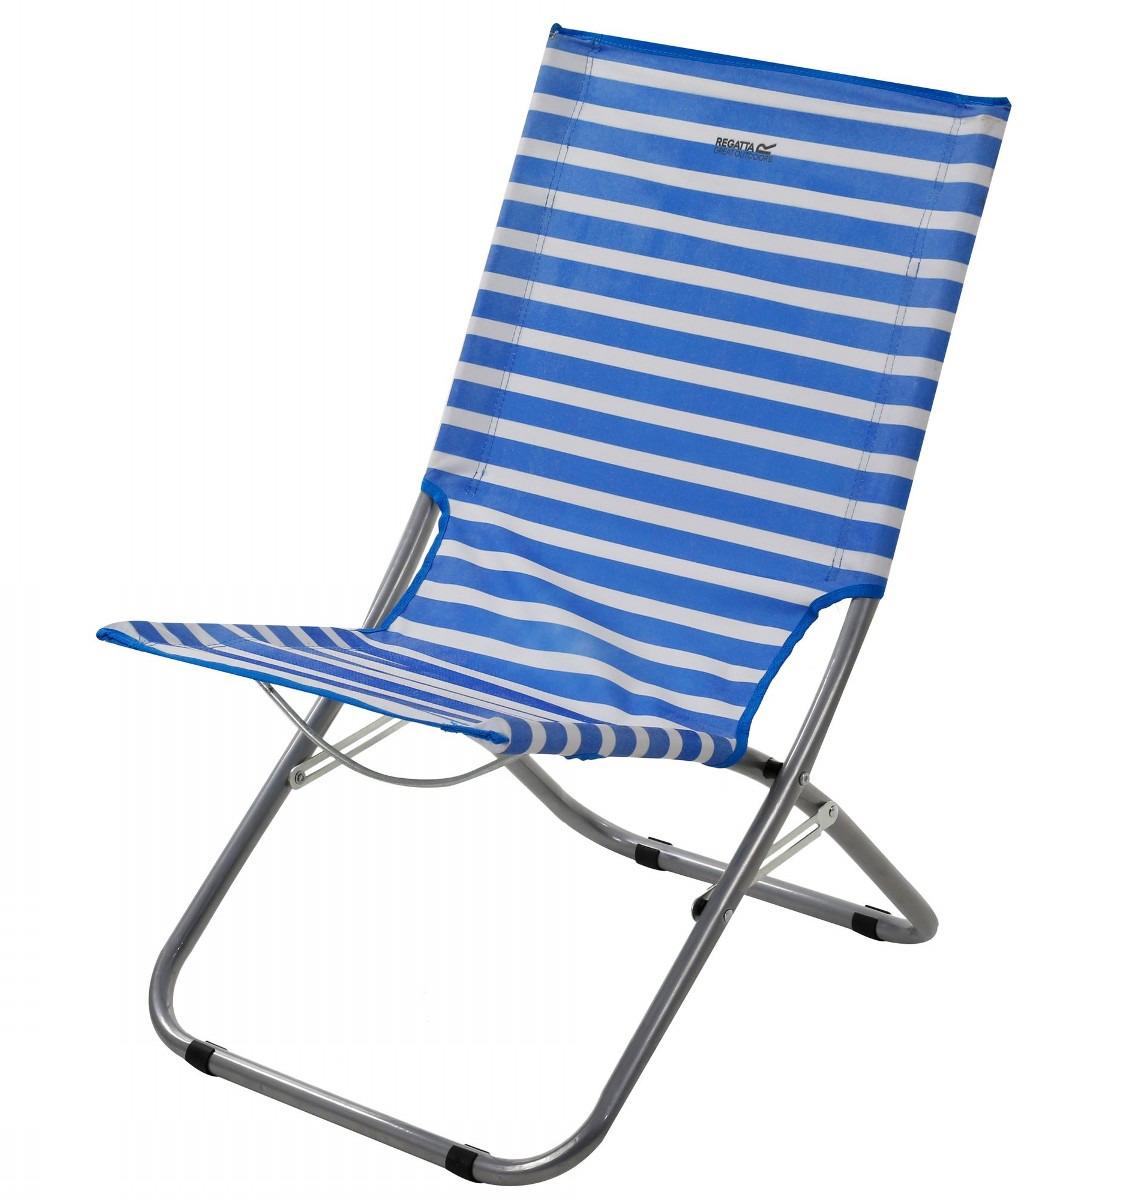 Стул складной Regatta Kruza Bch Lounger, RCE242, синий adjustable rattan sun lounger patio garden beach lounger transport by sea